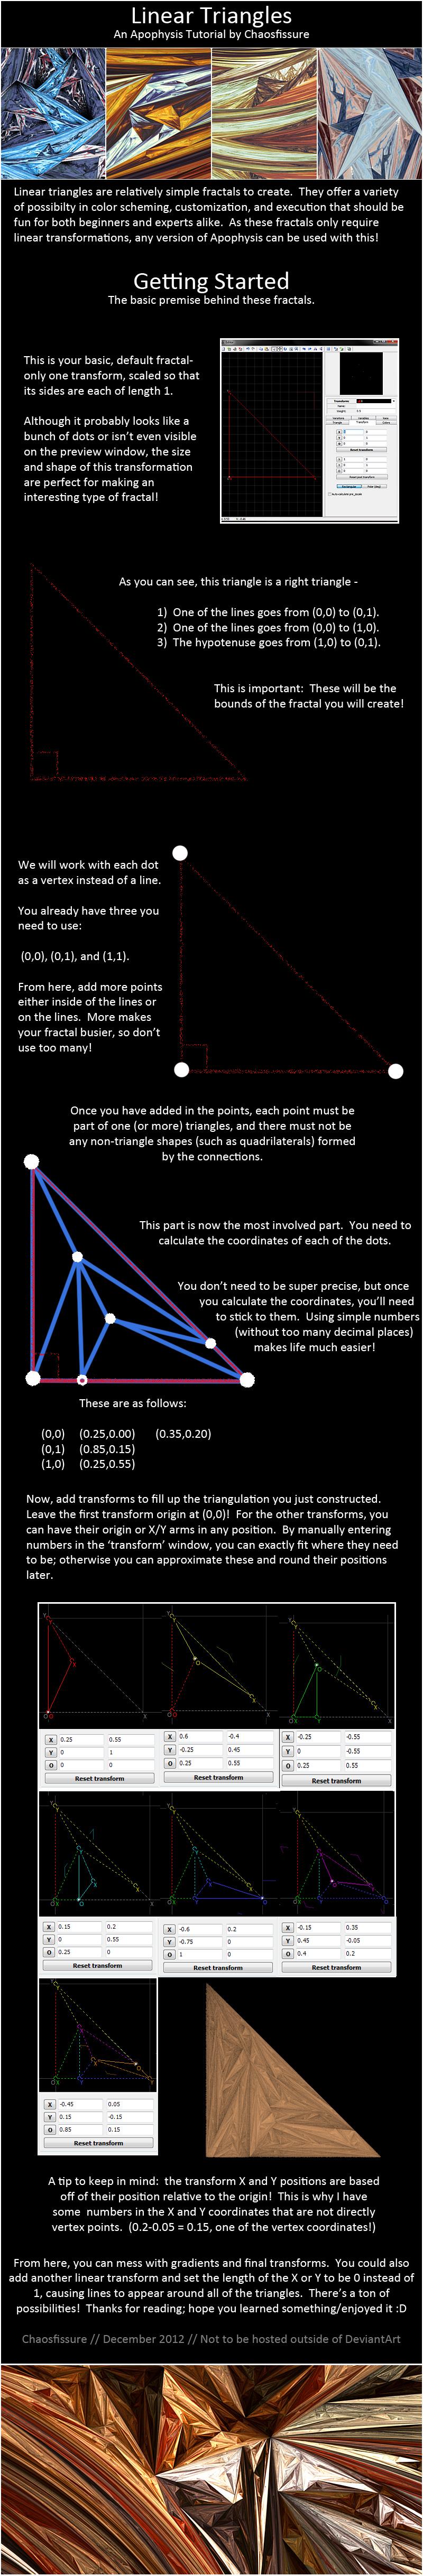 Apophysis - Linear Triangles